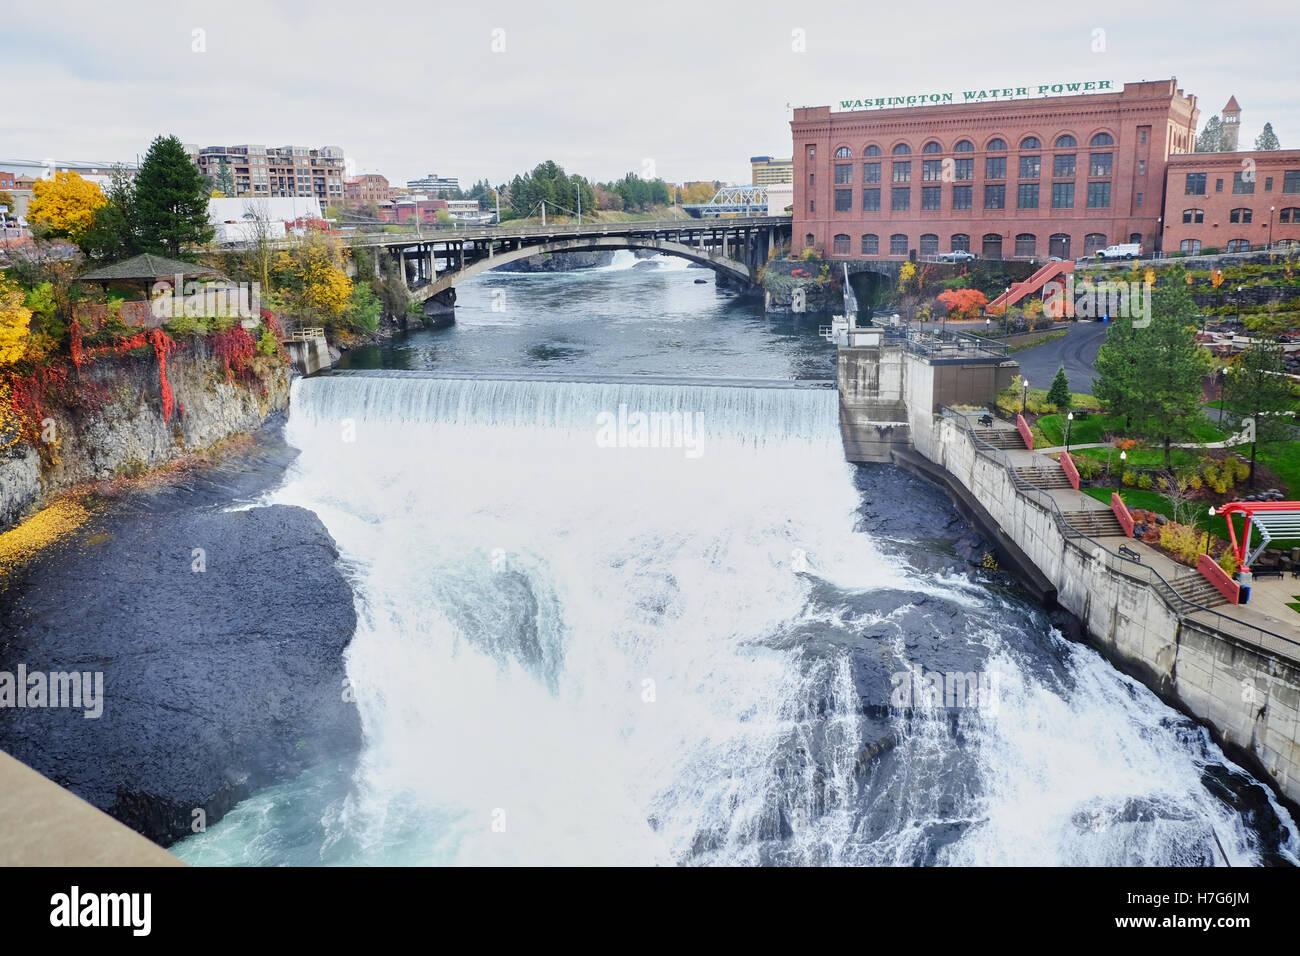 washington water power station - Avista Stock Photo